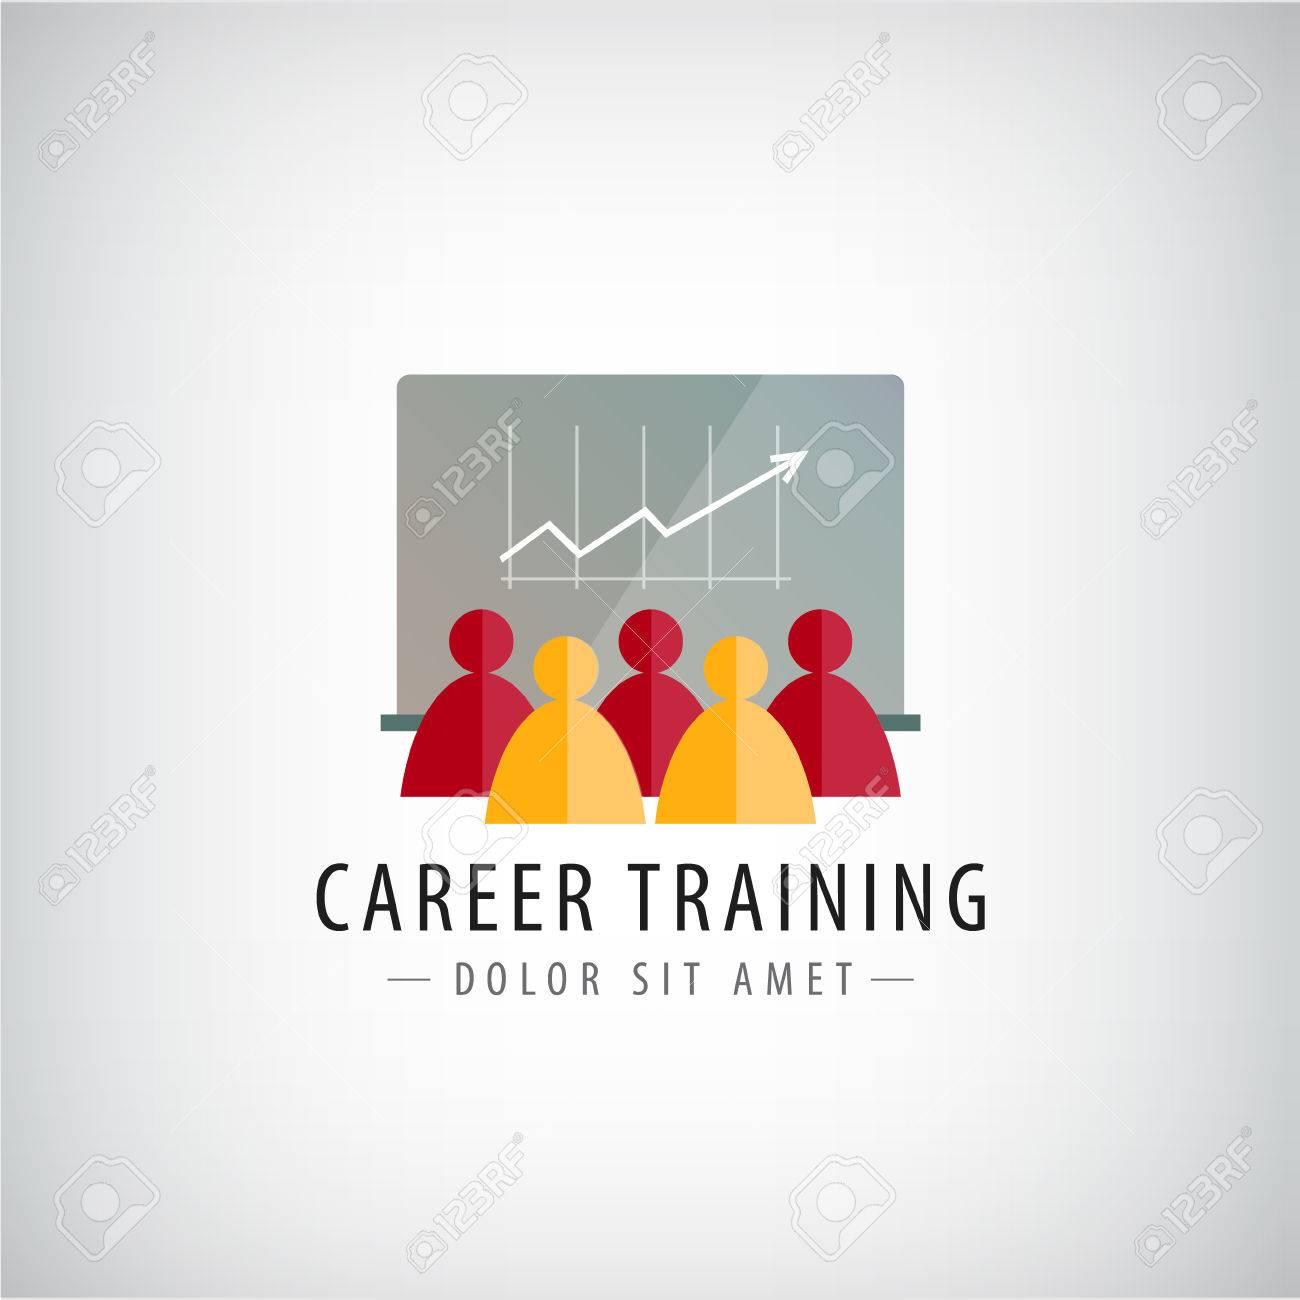 Vector career training, business meeting, teamwork logo, illustration isolated - 51519913